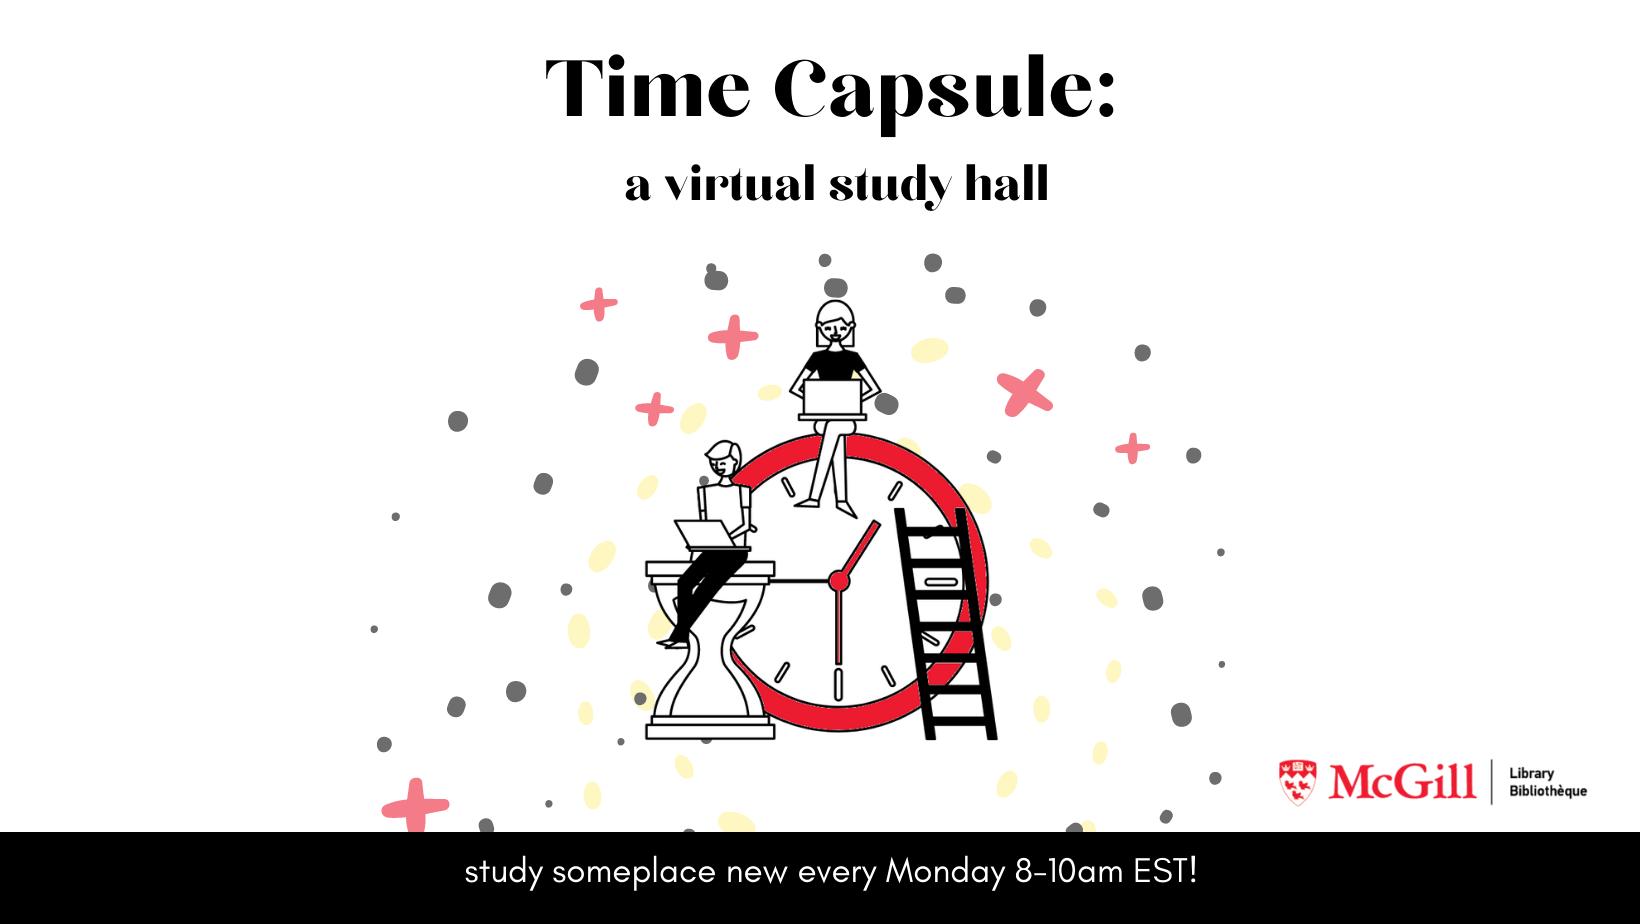 time capsule study halls every monday 8-10am EST